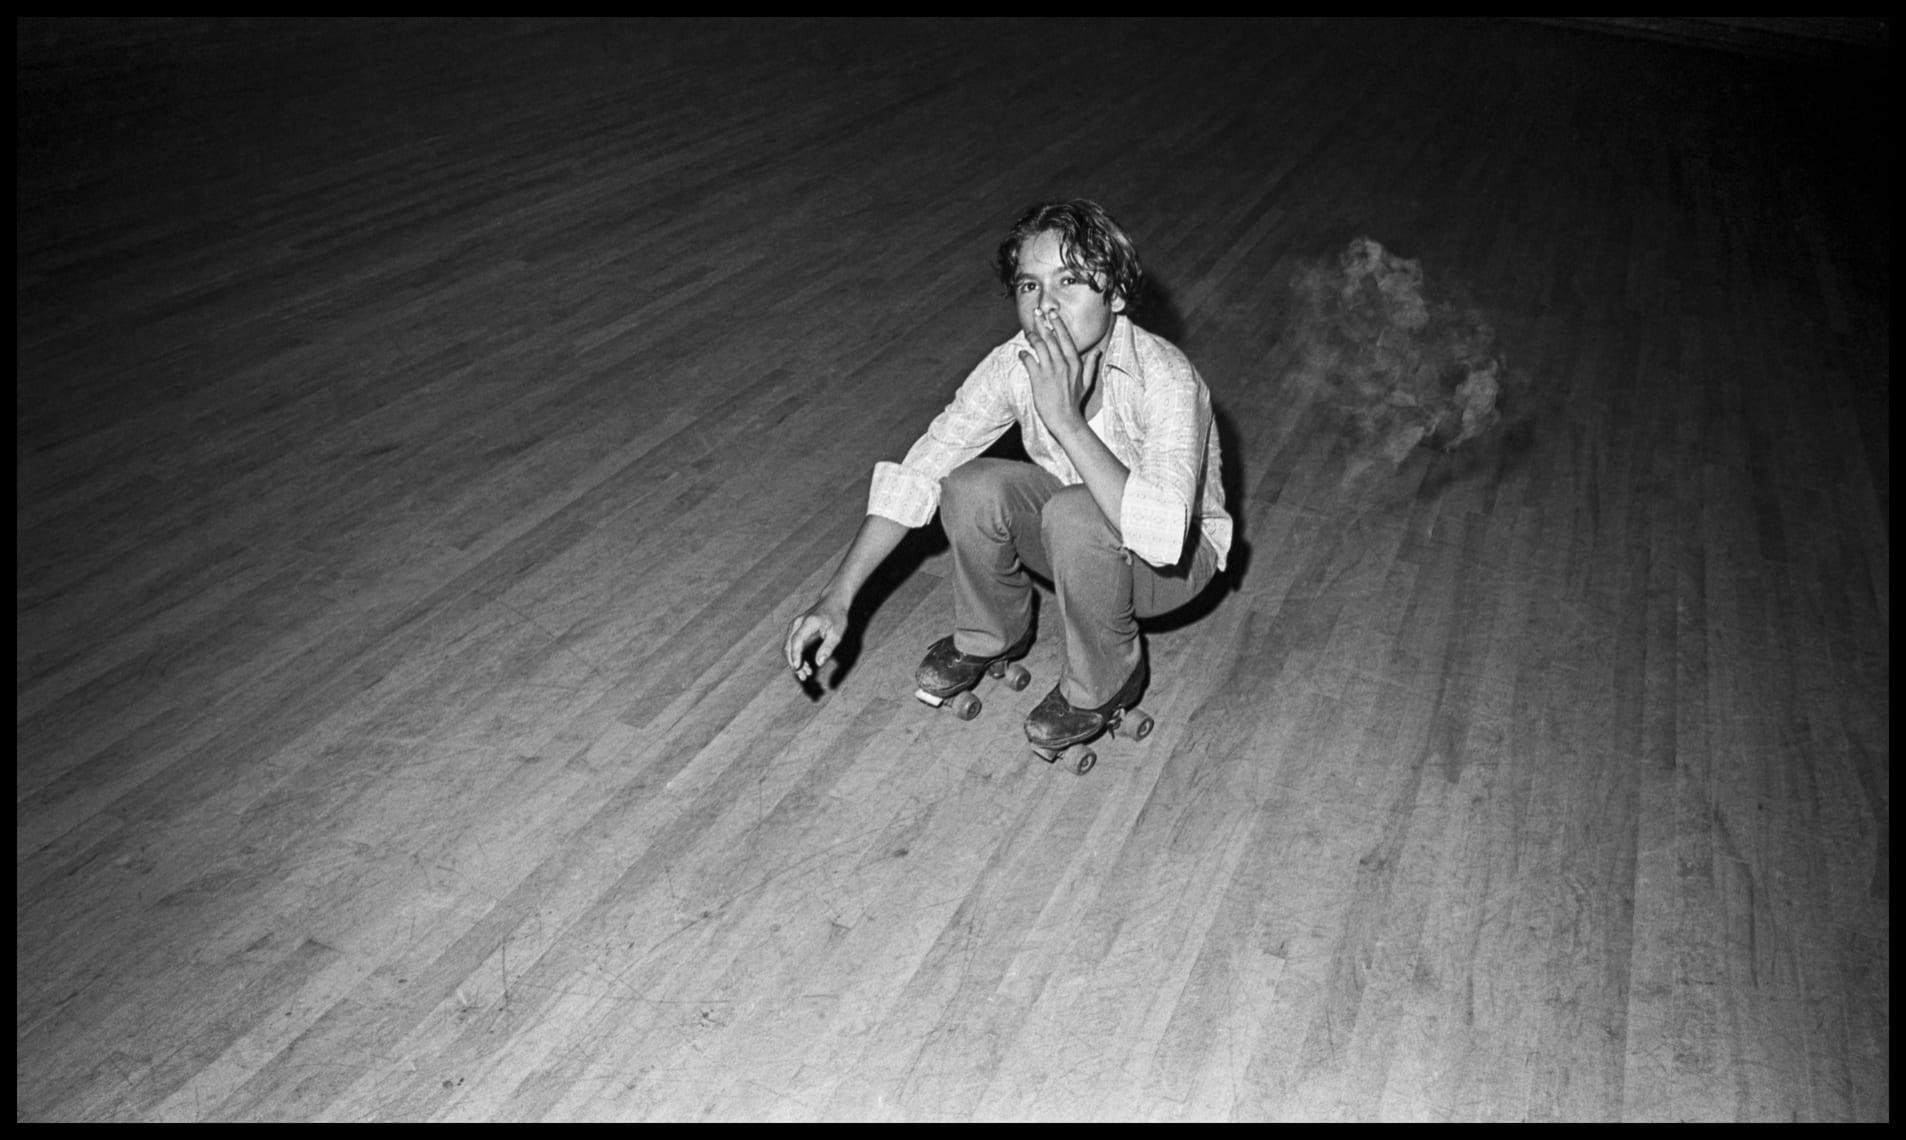 Sweetheart Roller Skating Rink - 1972-1973 - Six Mile Creek, Hillsborough County (Tampa) FL ©Bill Yates